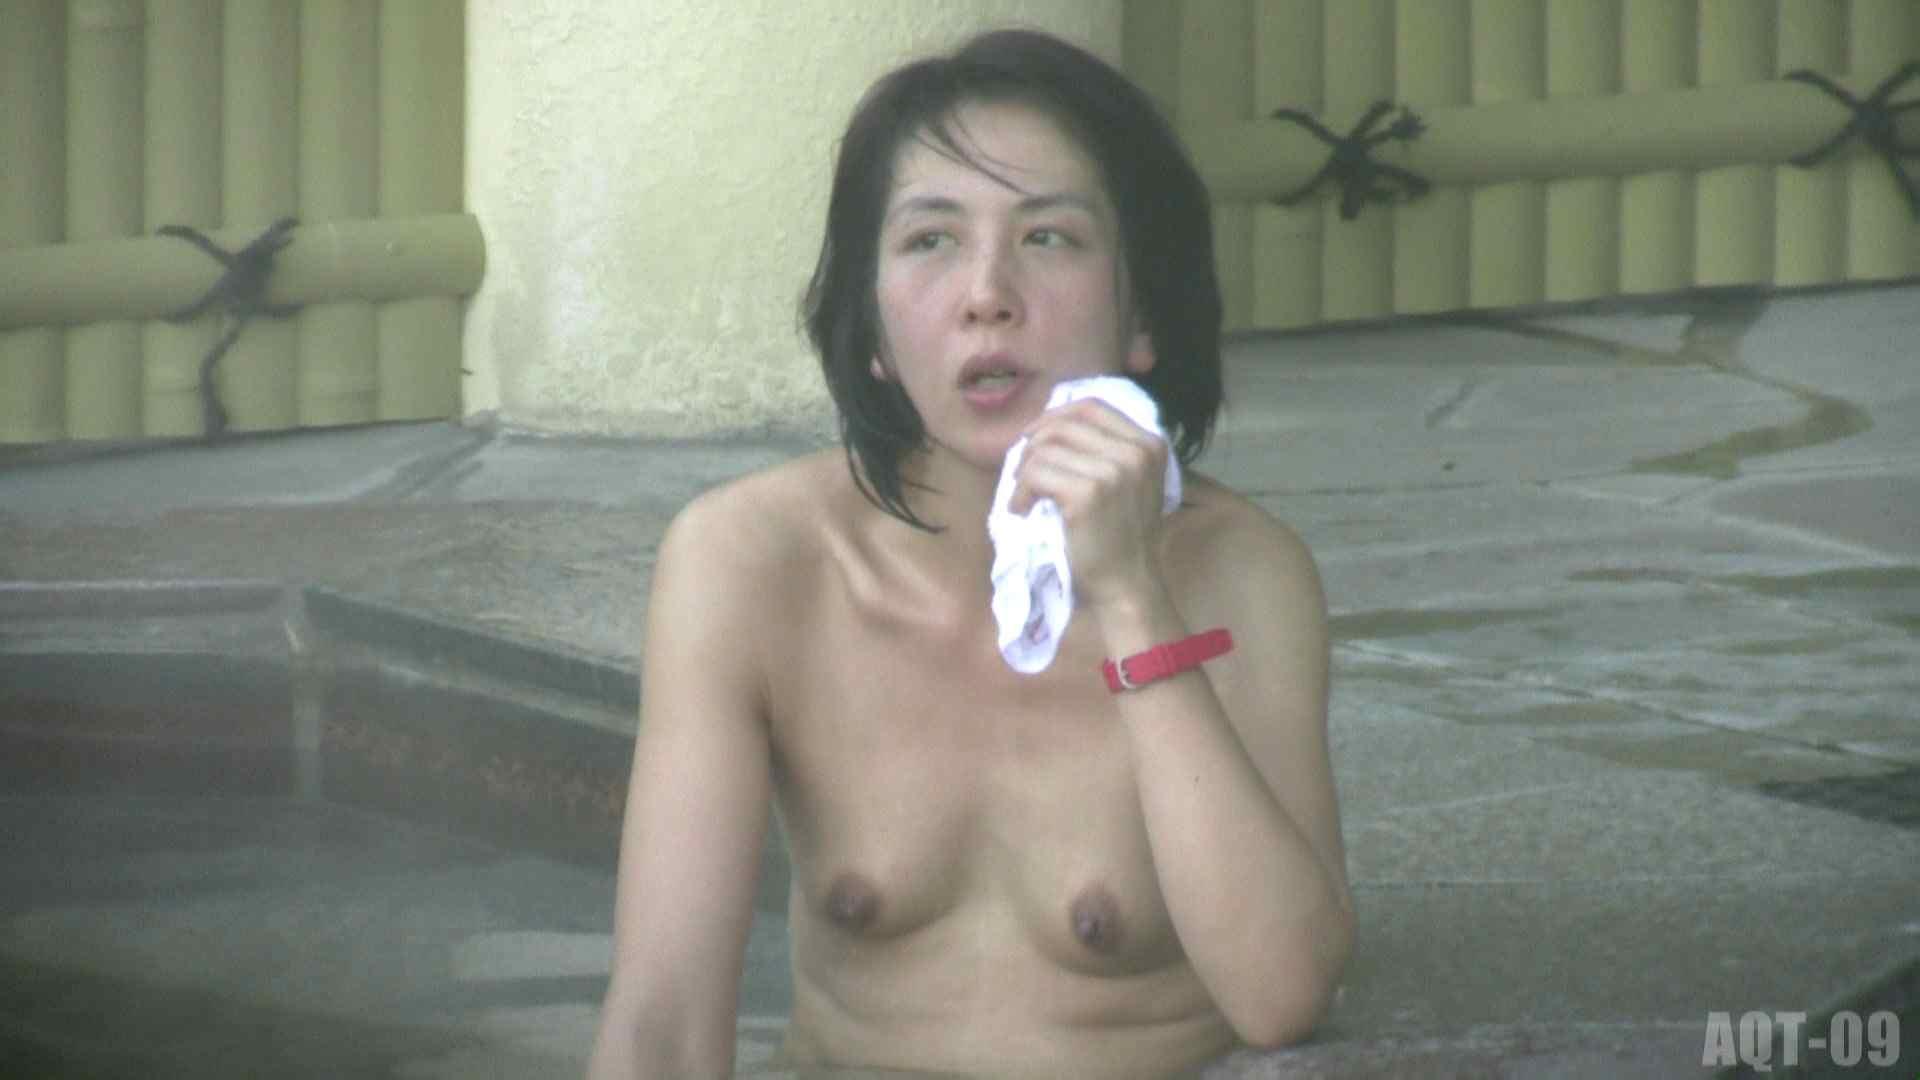 Aquaな露天風呂Vol.788 OL女体 セックス無修正動画無料 44連発 26